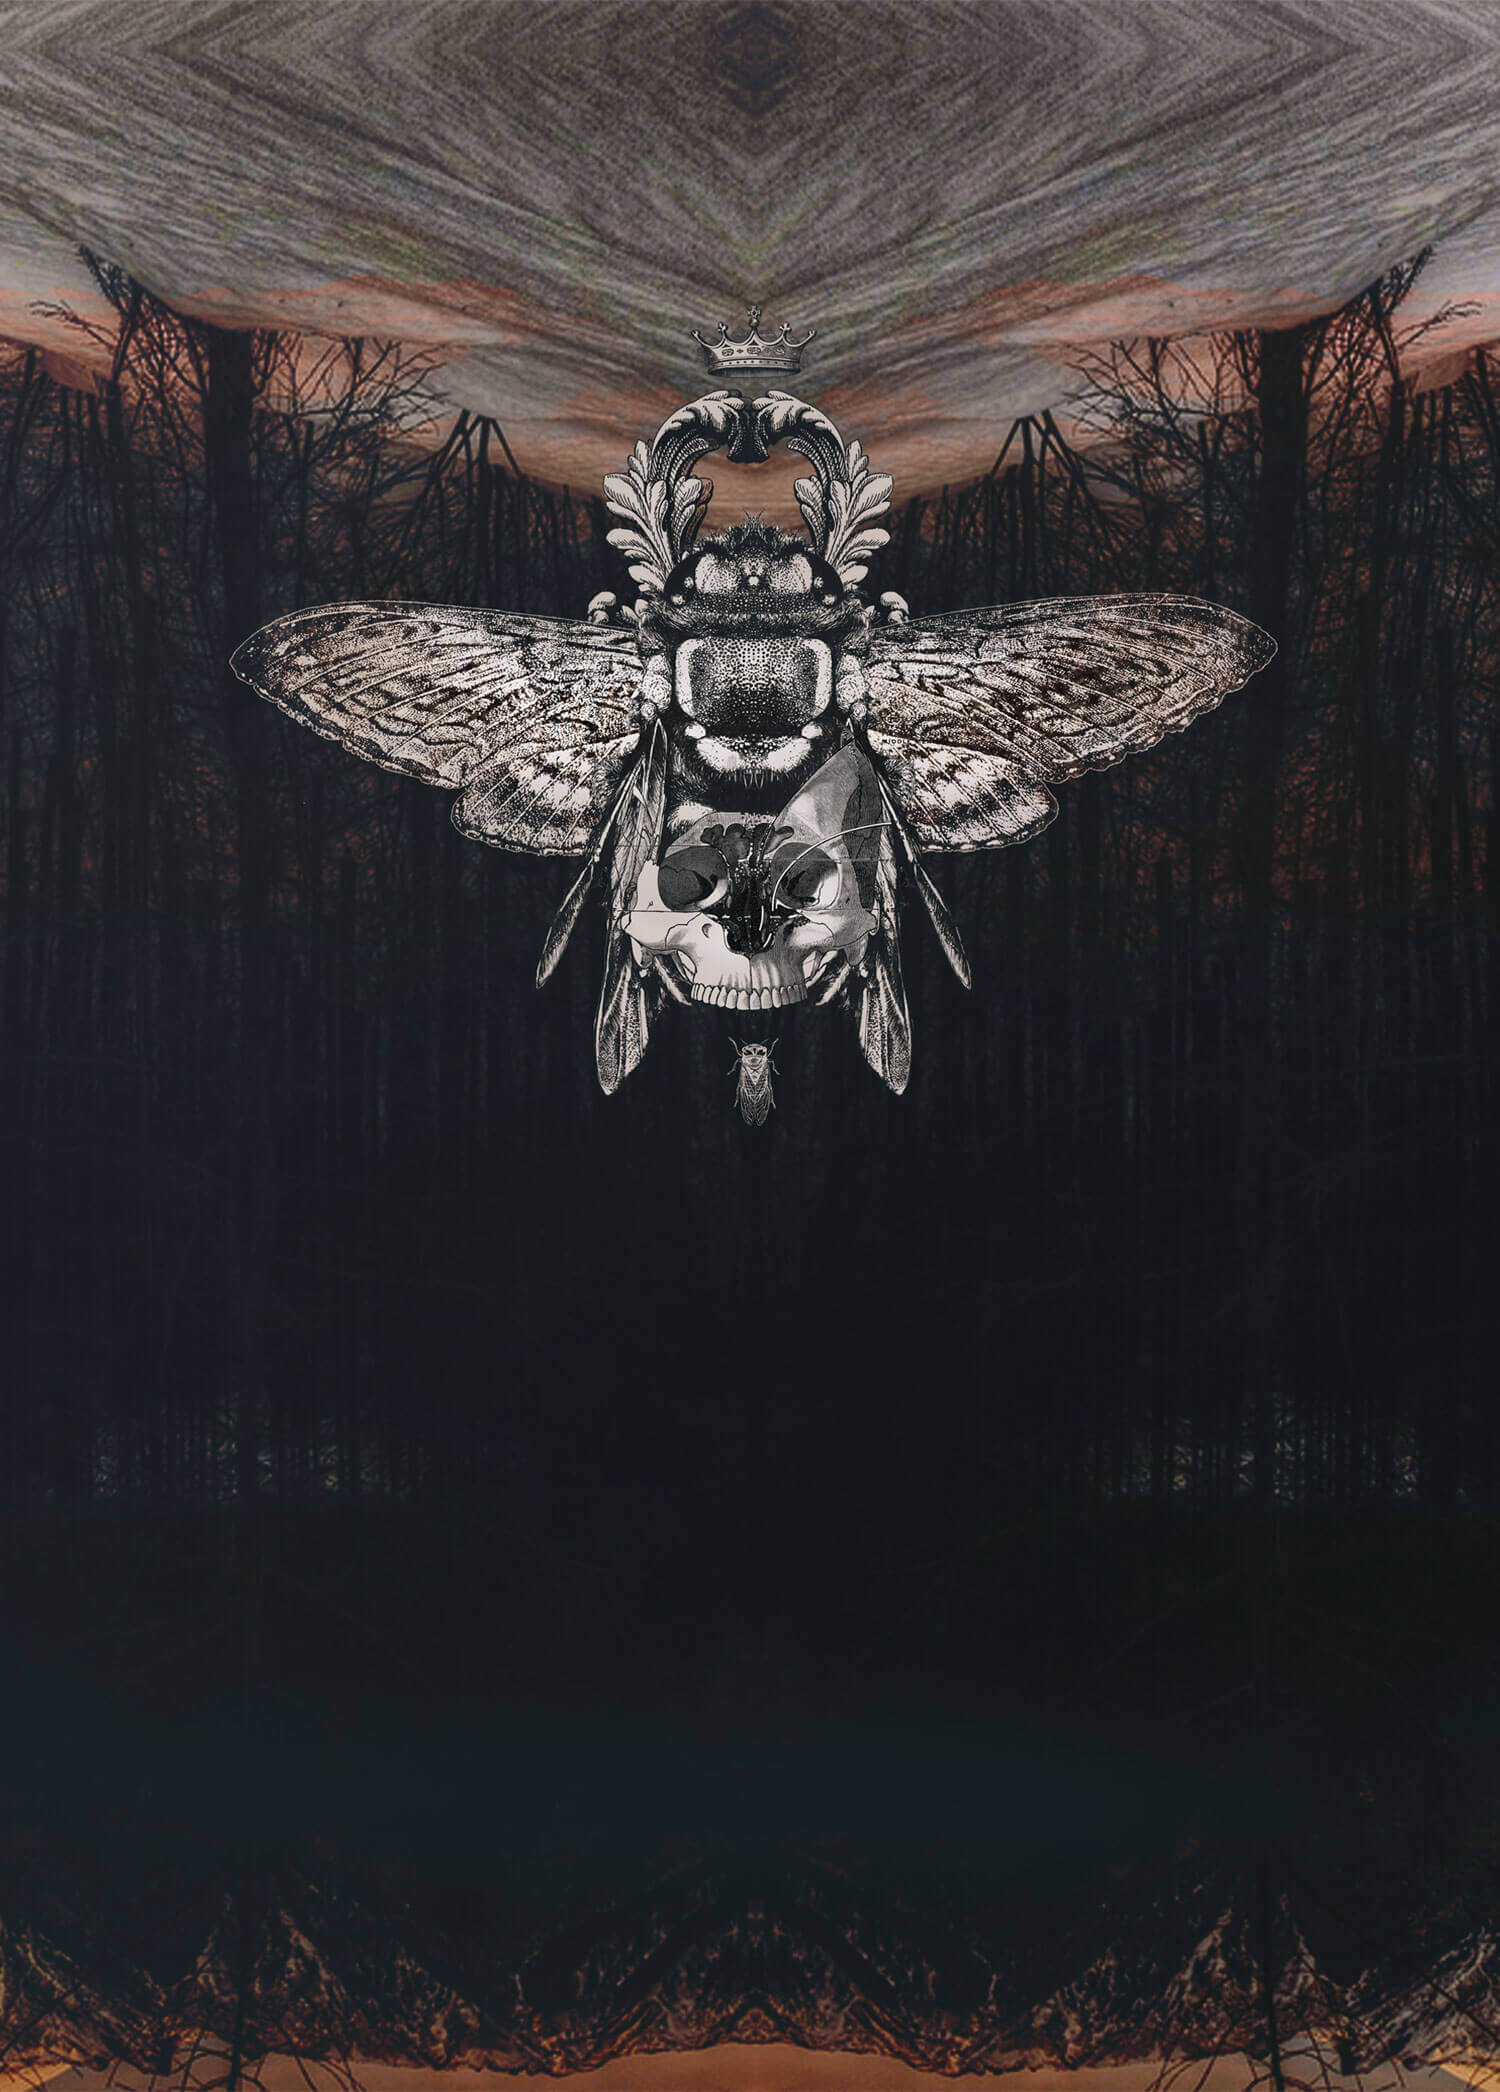 olga_mulica_forest_moth_1-1